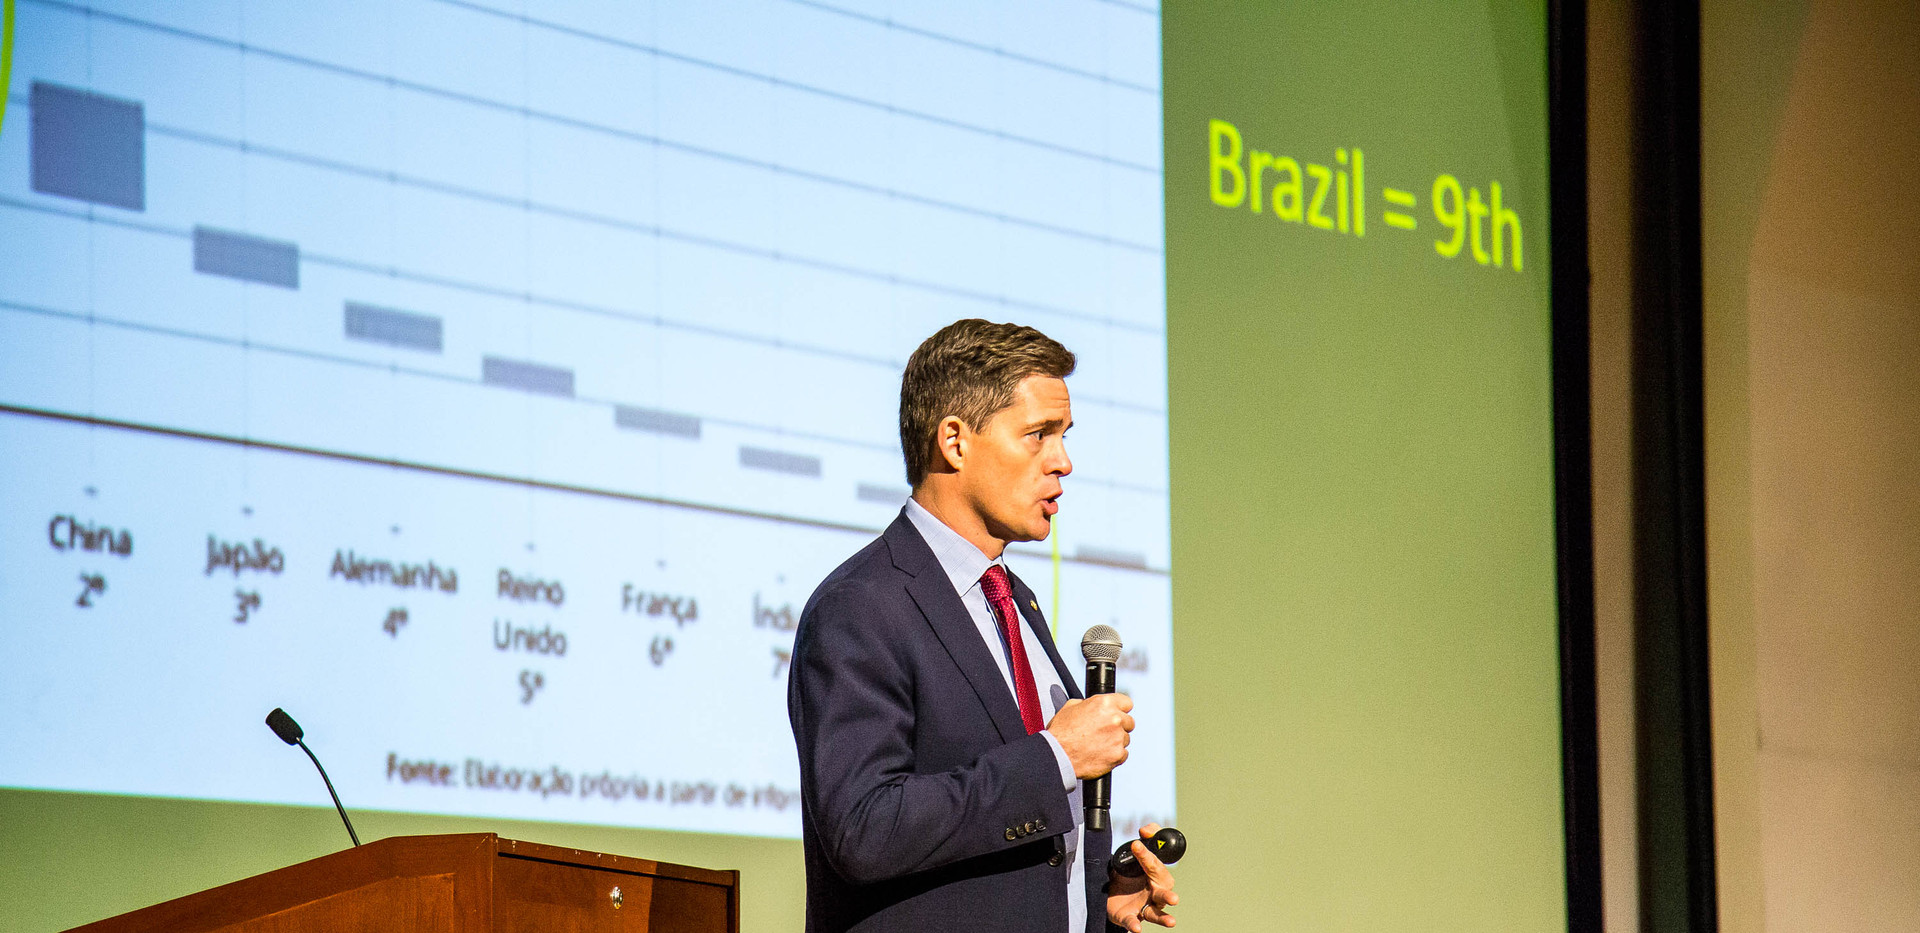 Brazil-FloridaStudentConference-24.jpg